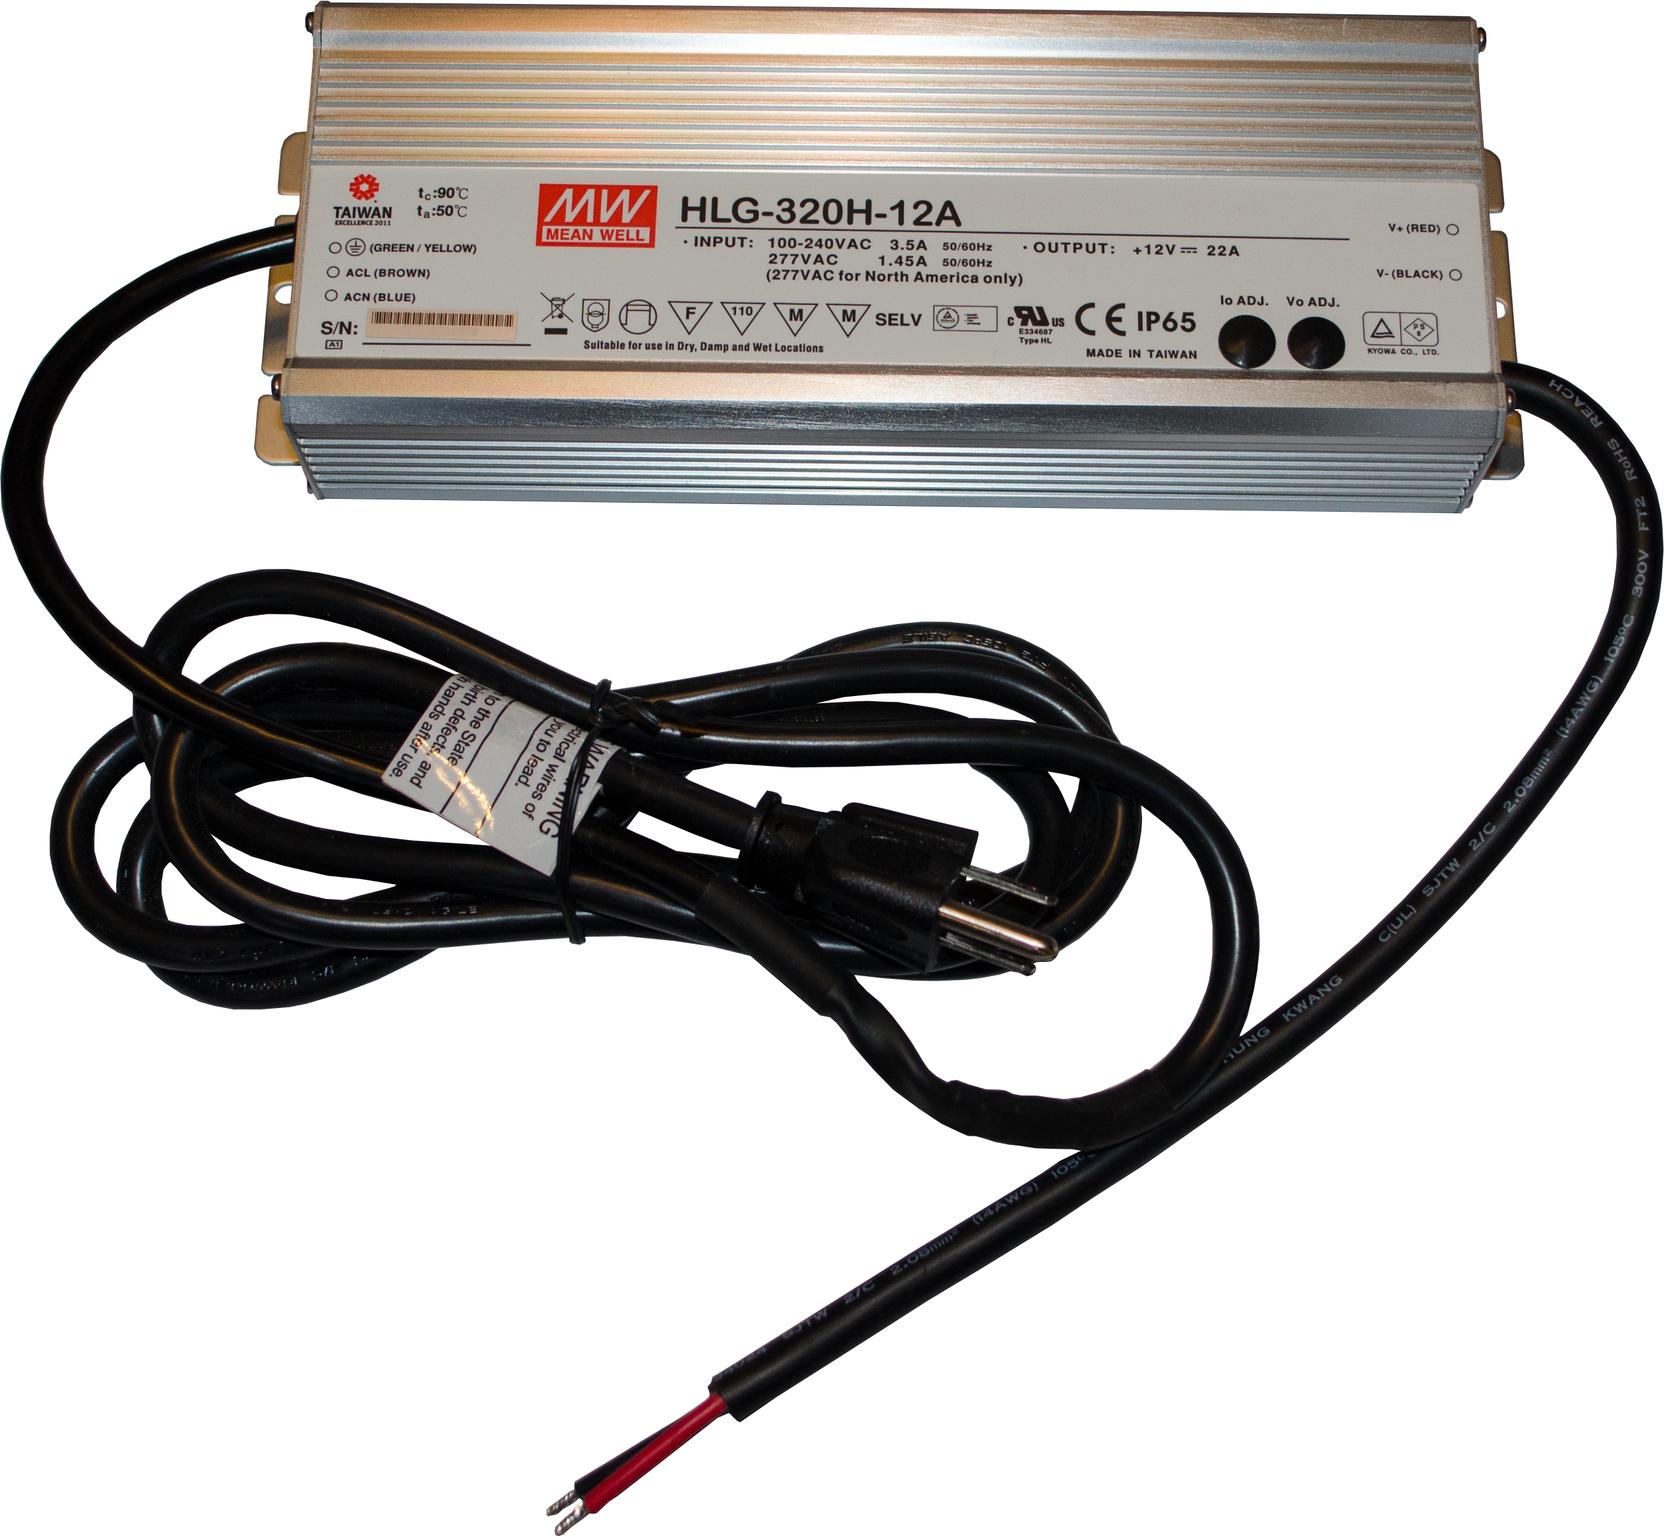 12 Volt / 22 Amp Outdoor Power Supply — Keen Designs Inc